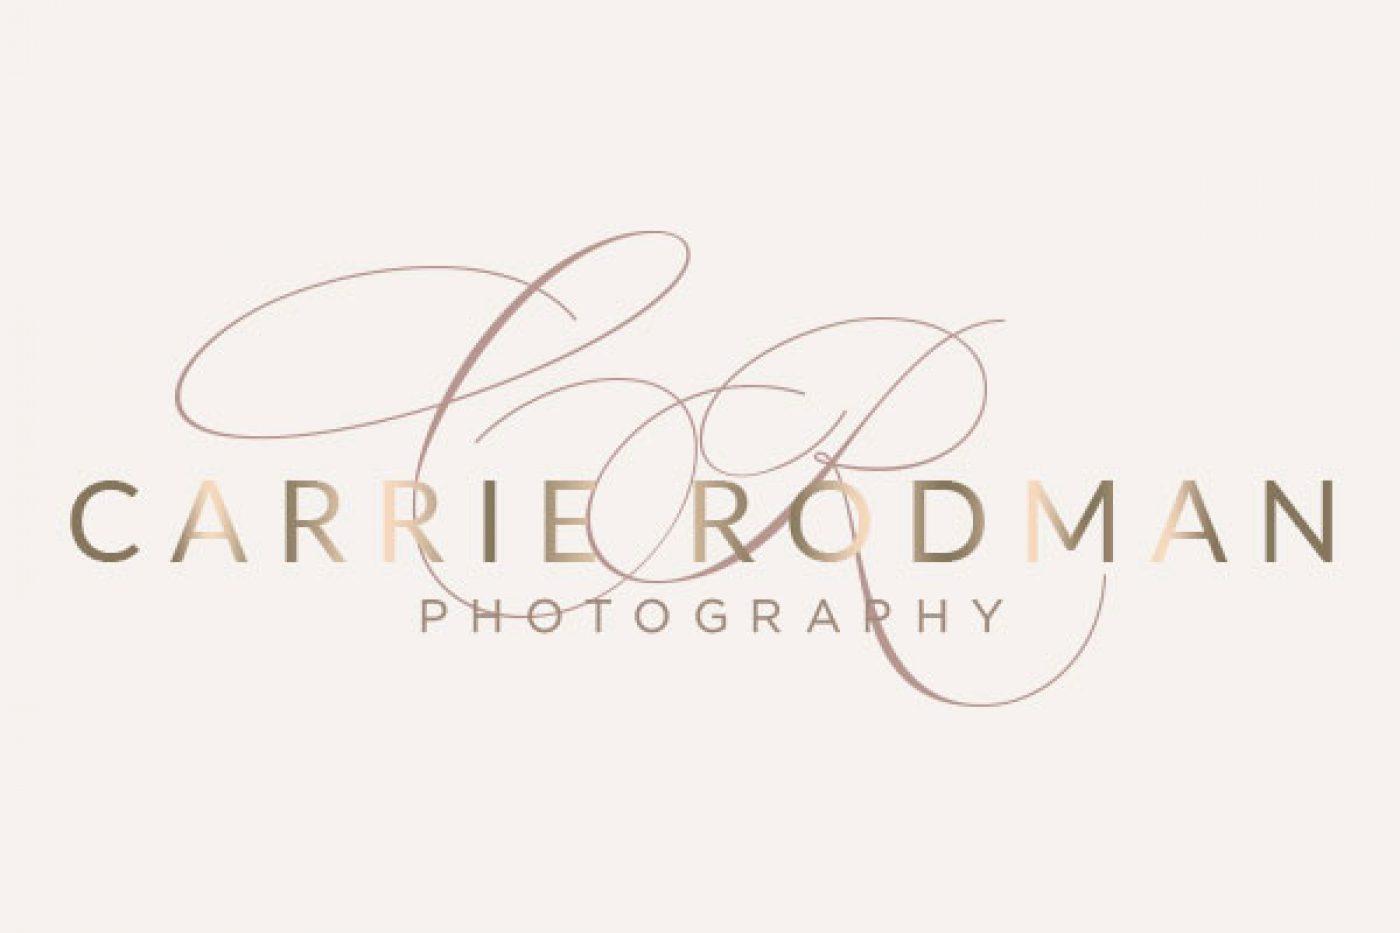 Carrie Rodman Photography